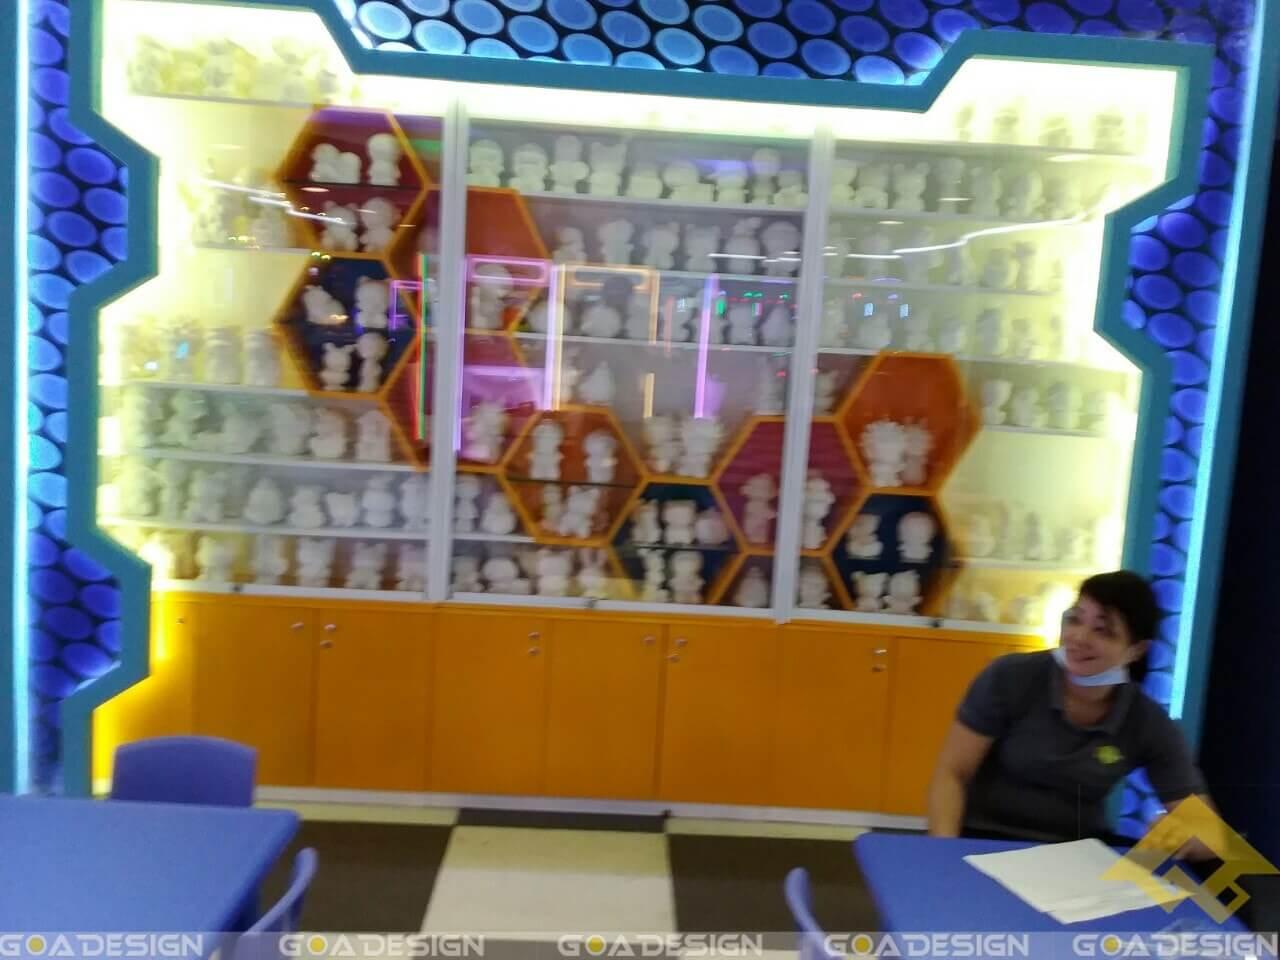 GOADESIGN Thiết kế khu vui chơi Lotte Mart - Q7 (14)